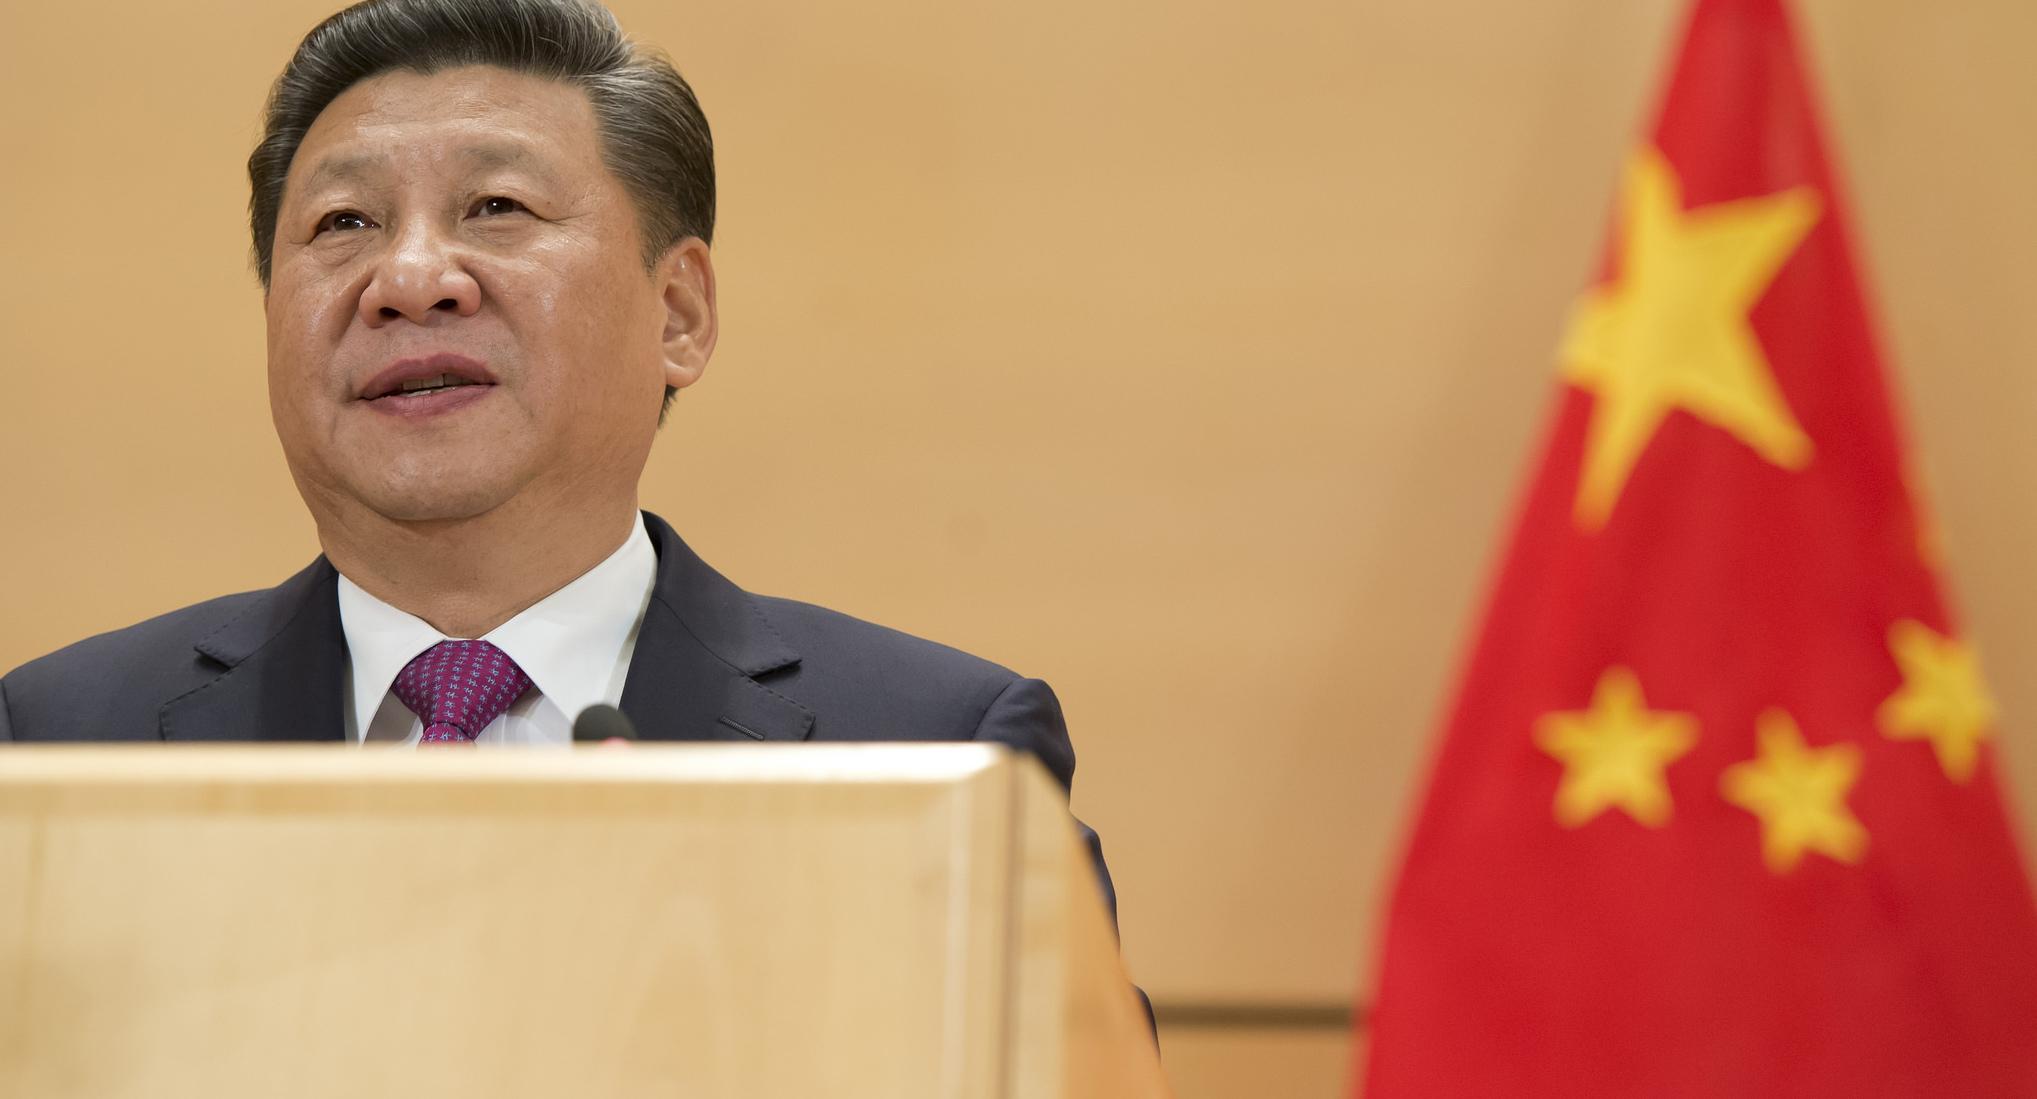 China's Xi Jinping (Photo: UNGeneva/Flickr)